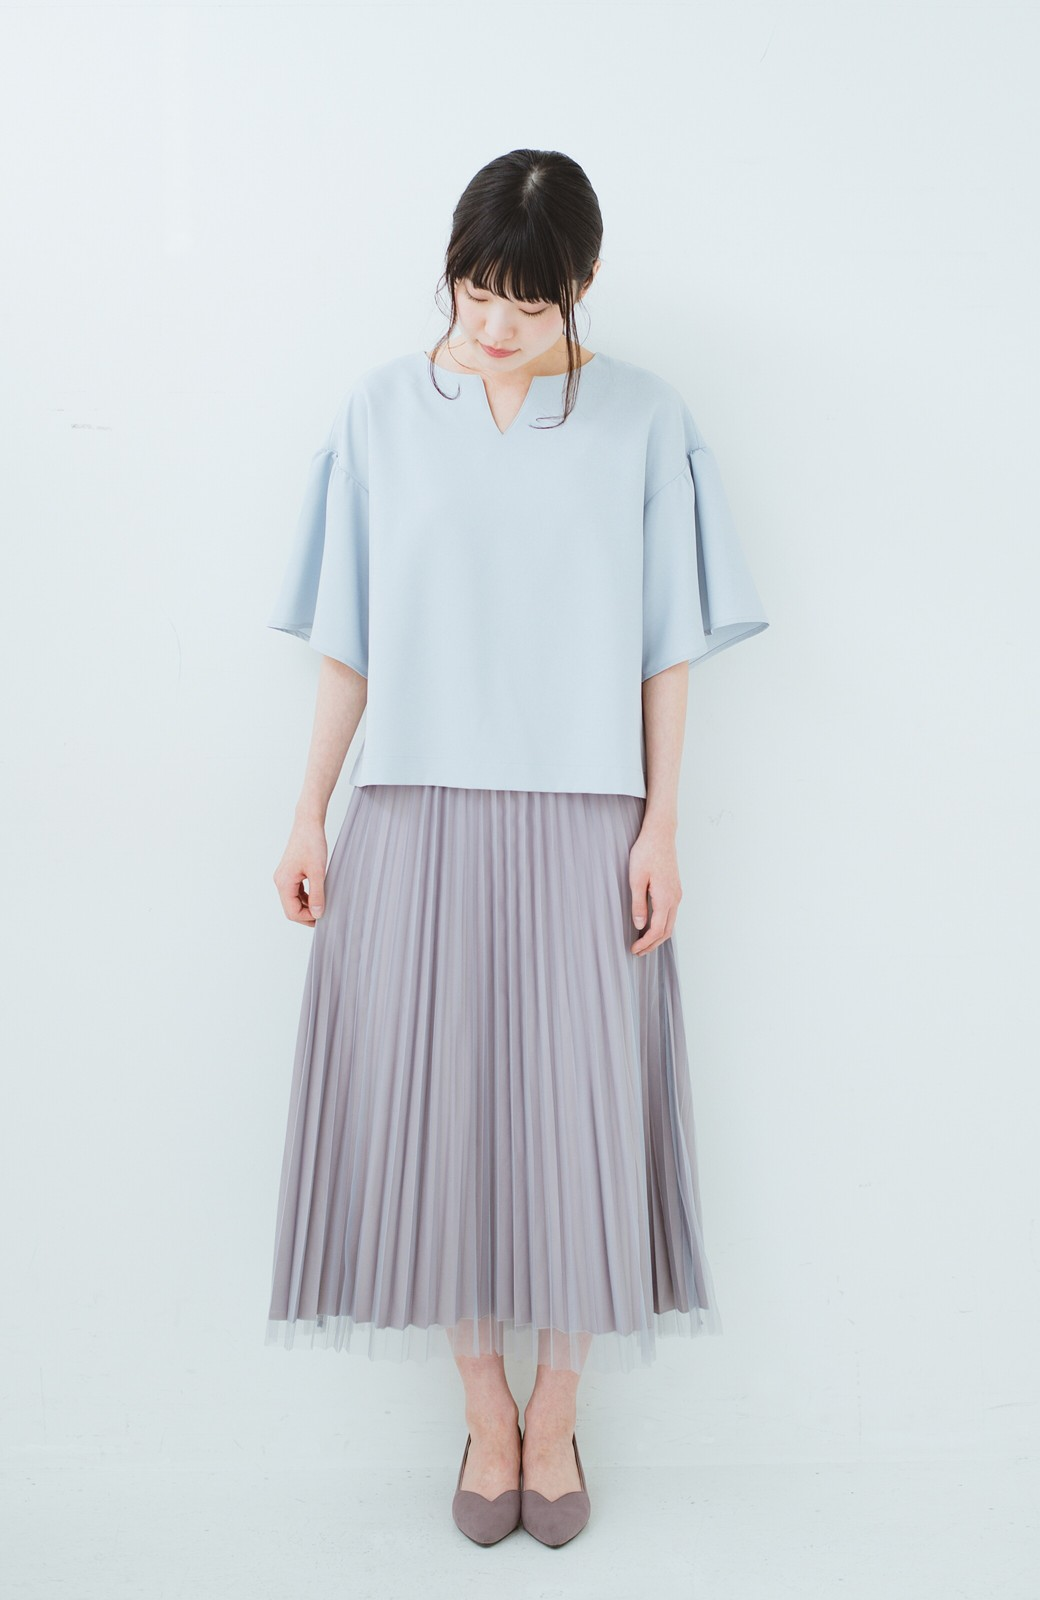 haco! どんな日も華やか気分にしてくれる 二枚仕立てのチュールプリーツスカート <ライトグレー>の商品写真13